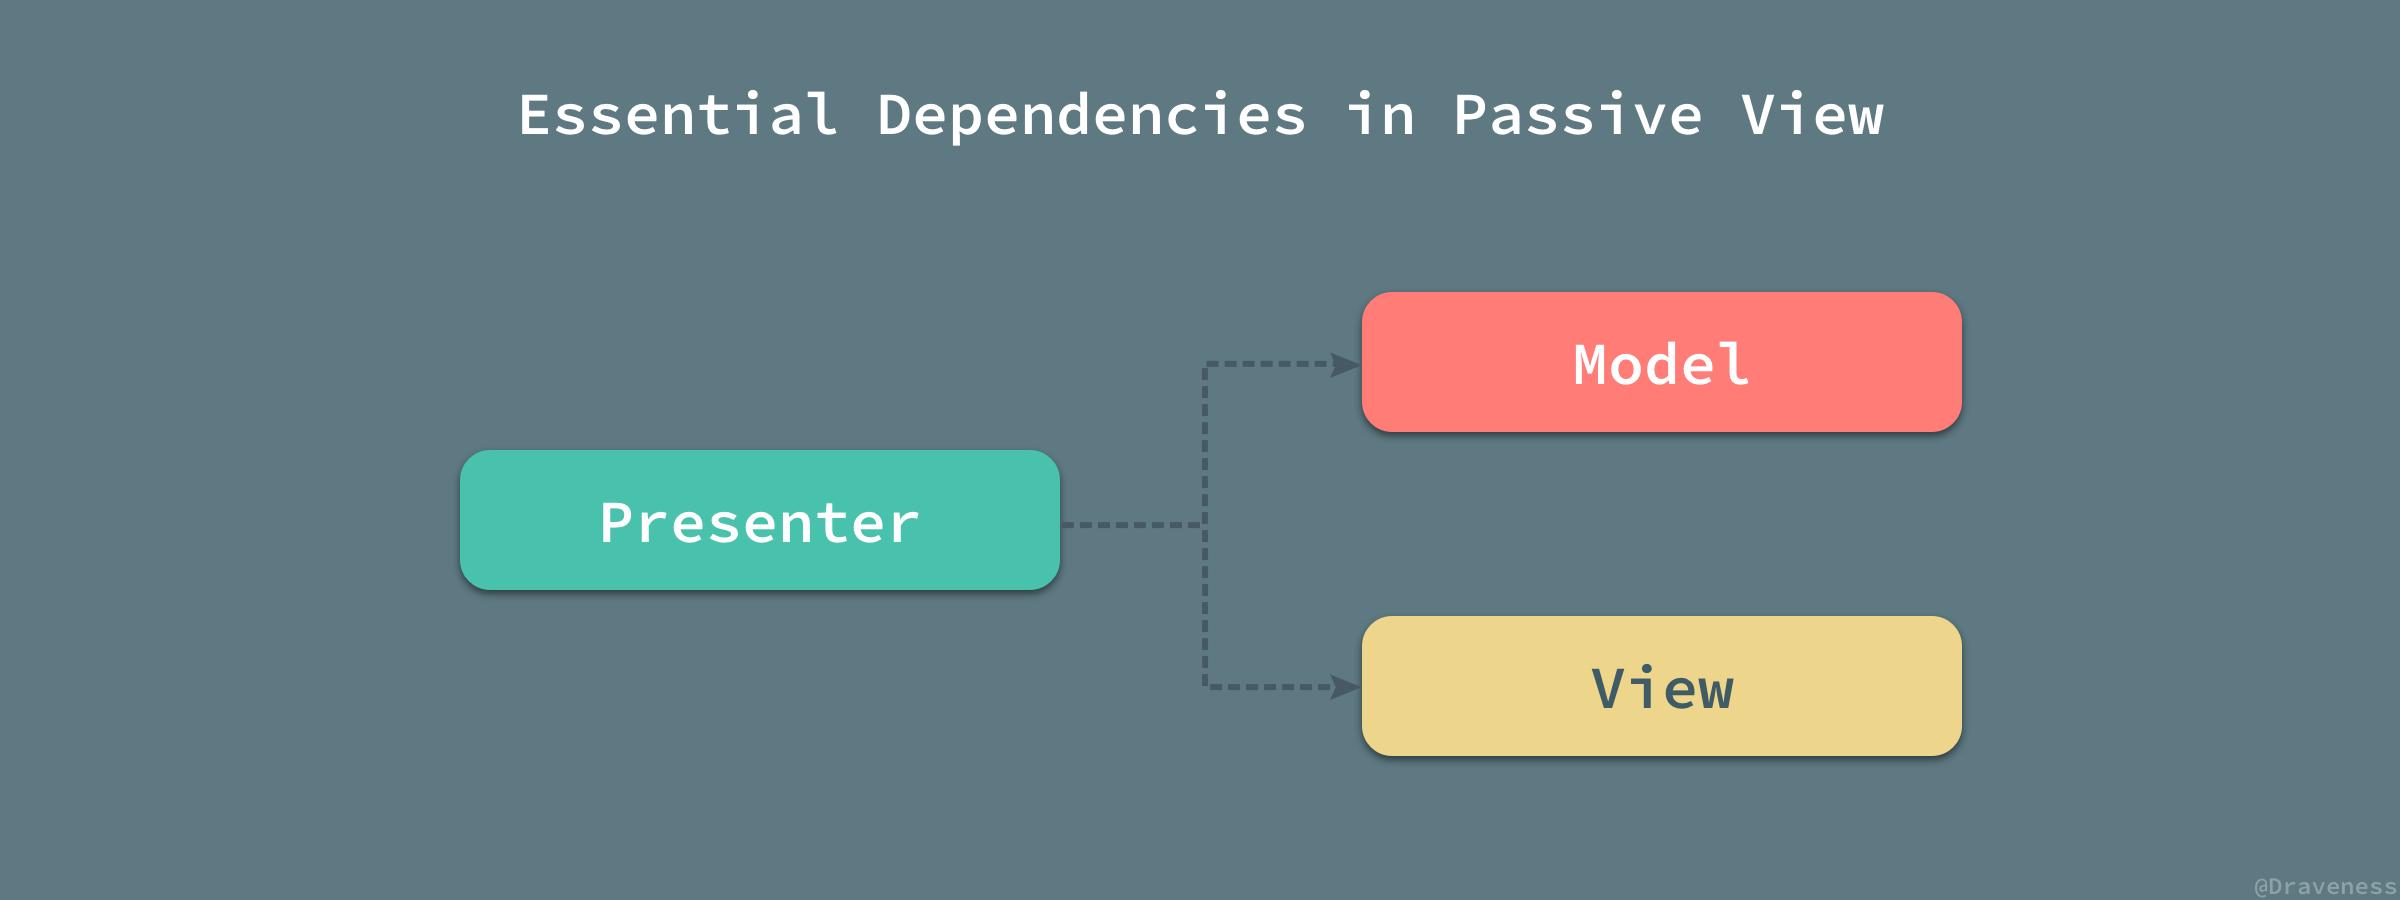 Essential-Dependencies-in-Passive-Vie